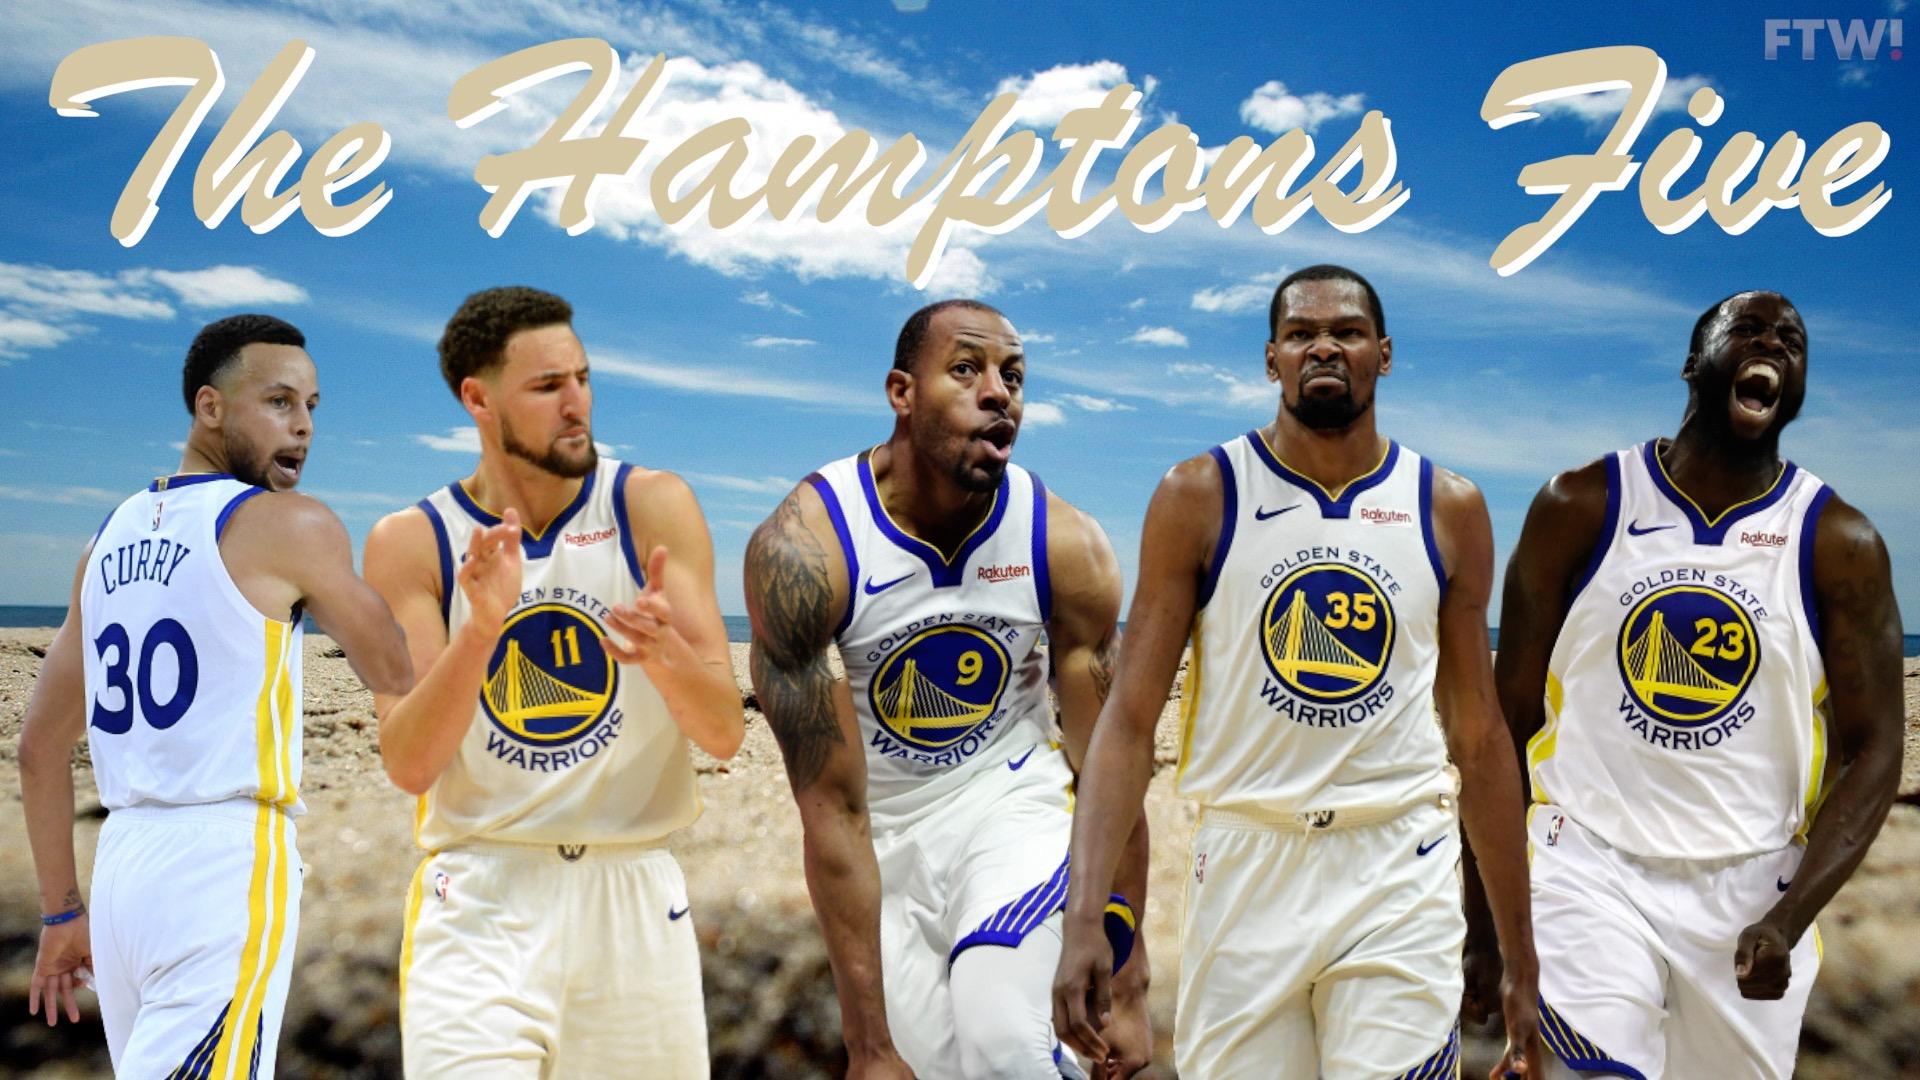 Hamptons Five